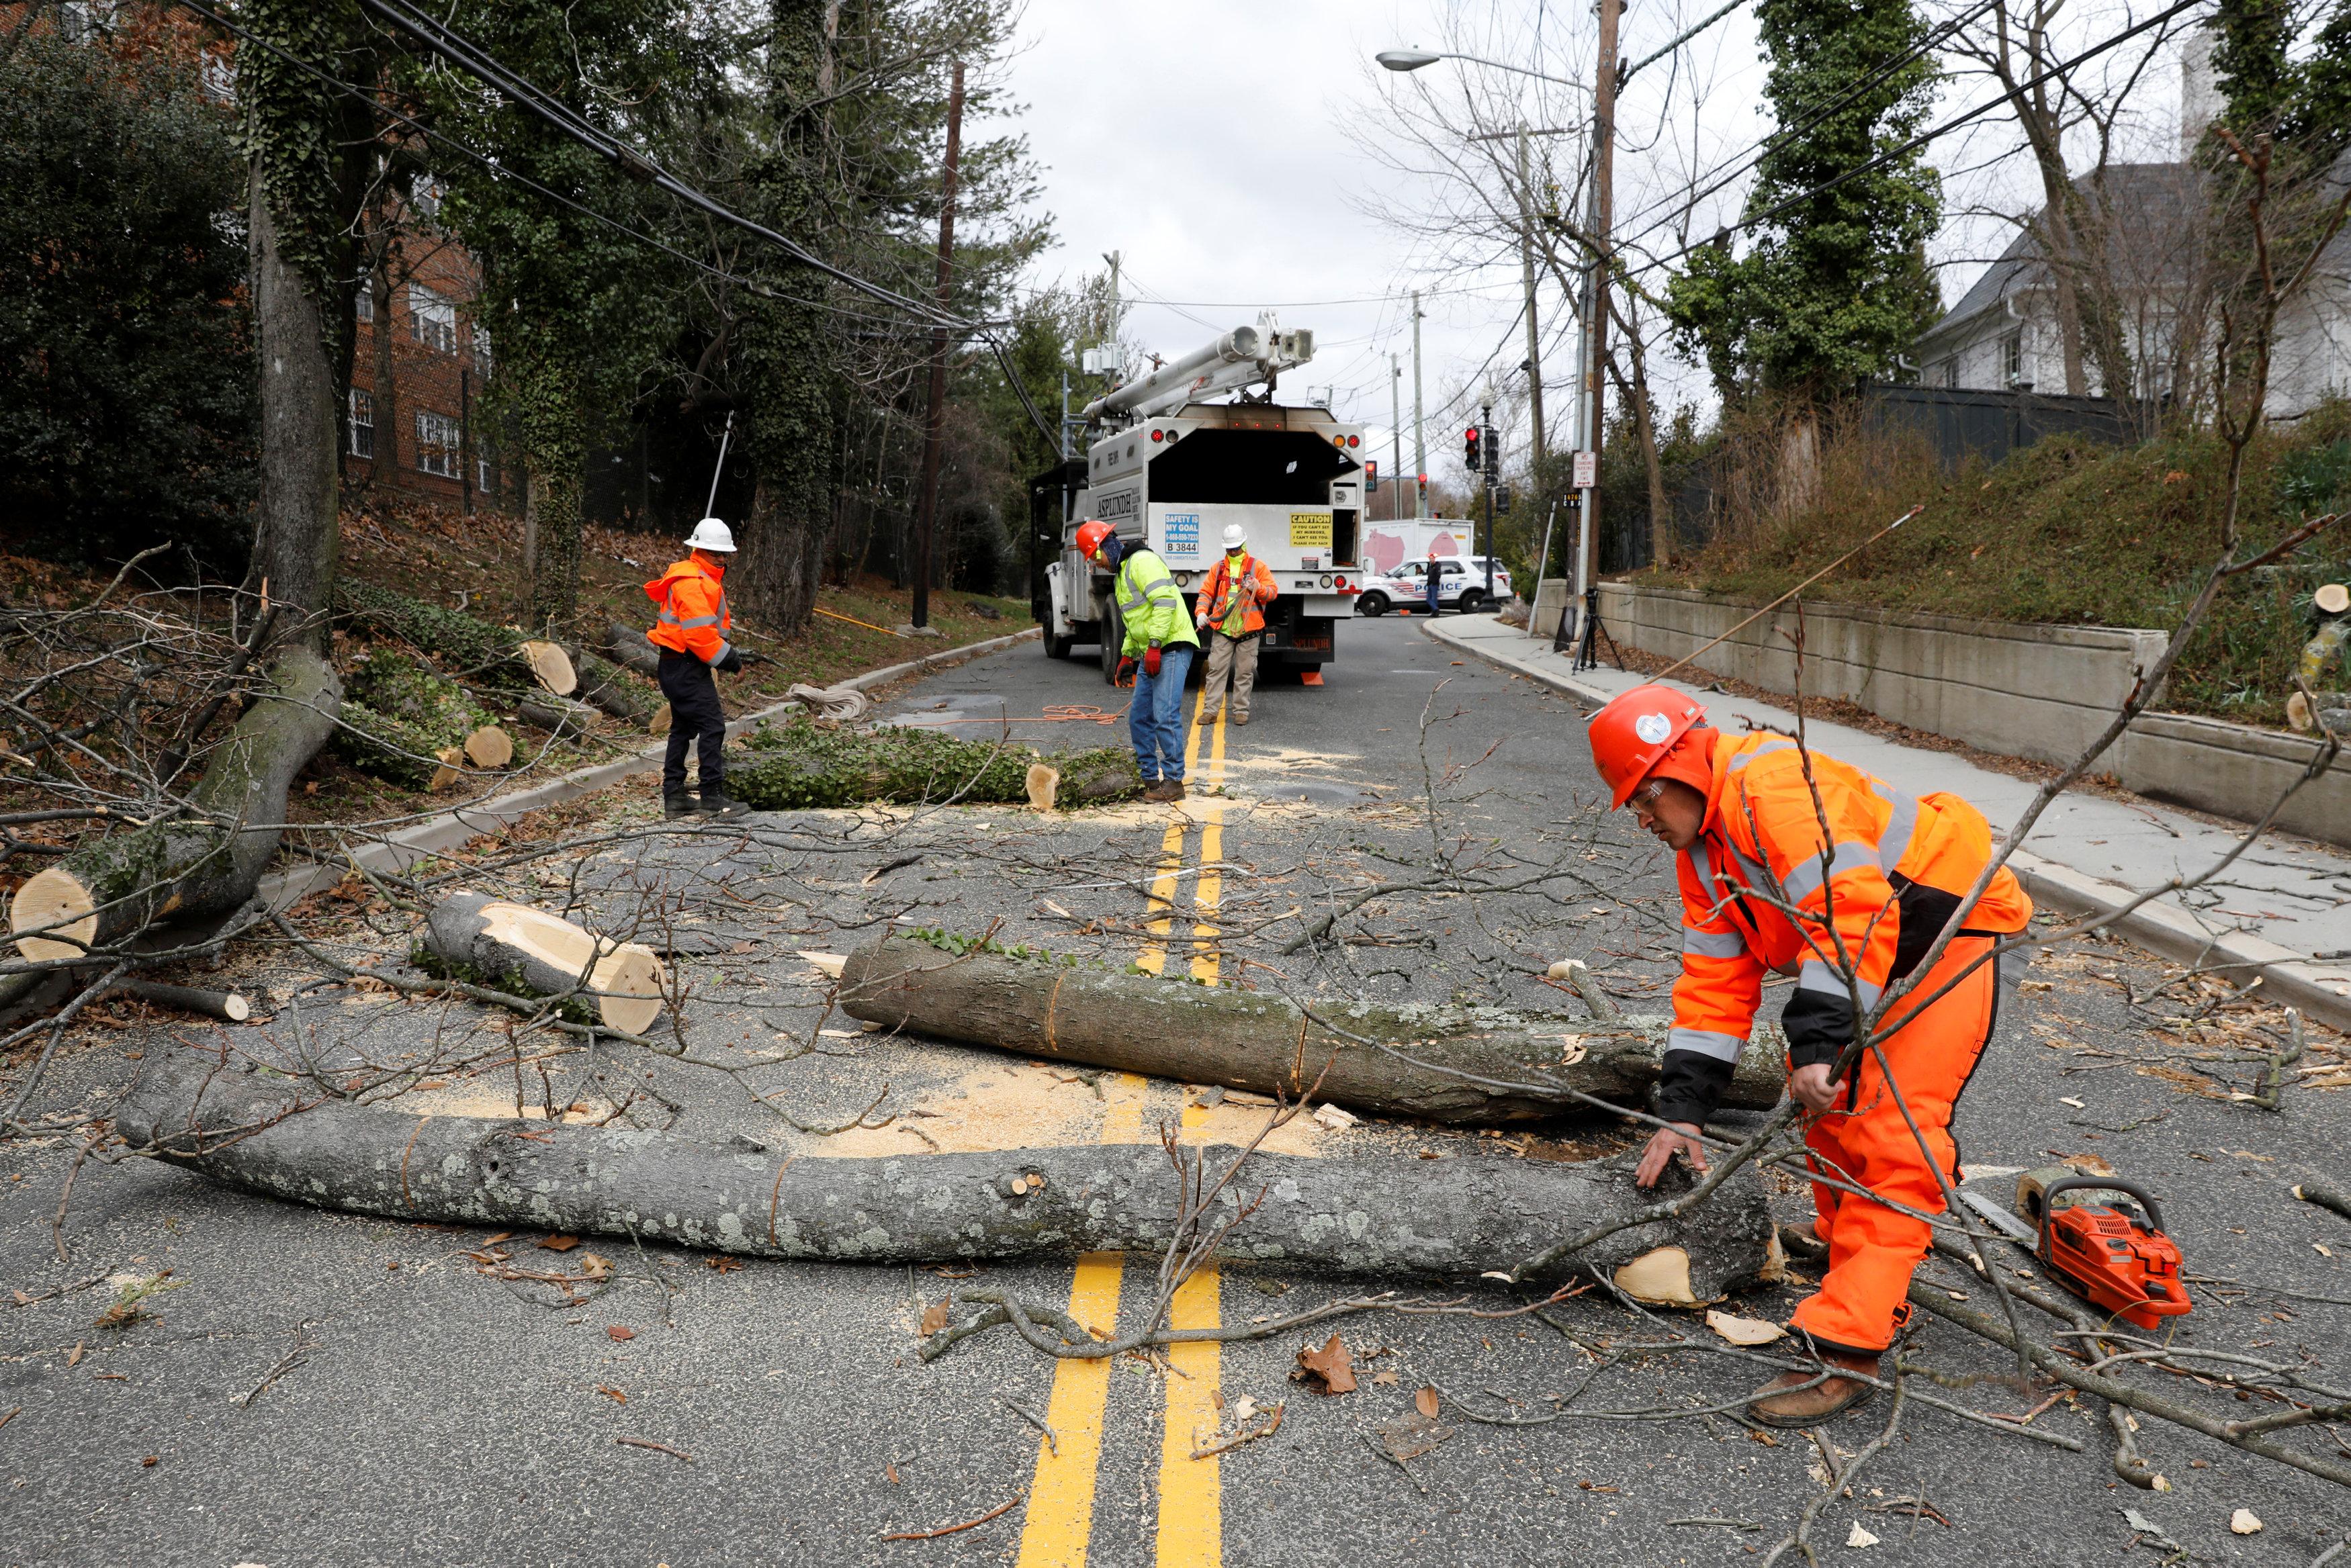 La tormenta causó estragos en Washington D.C. REUTERS/Yuri Gripas